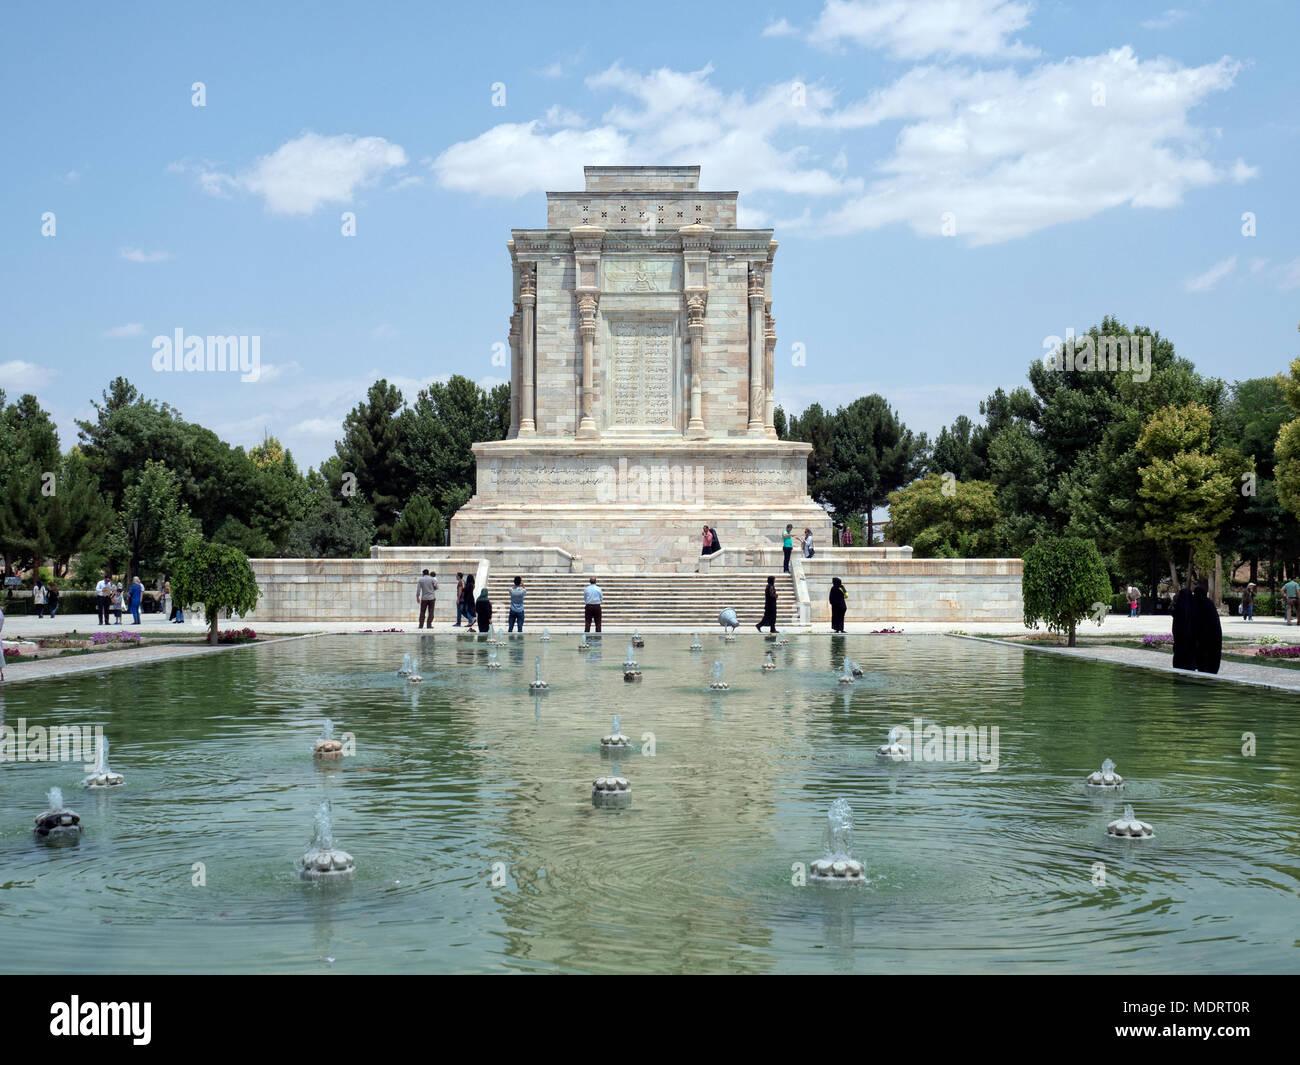 Tomb of persian poet Ferdowsi, Mashhad, Iran Stock Photo